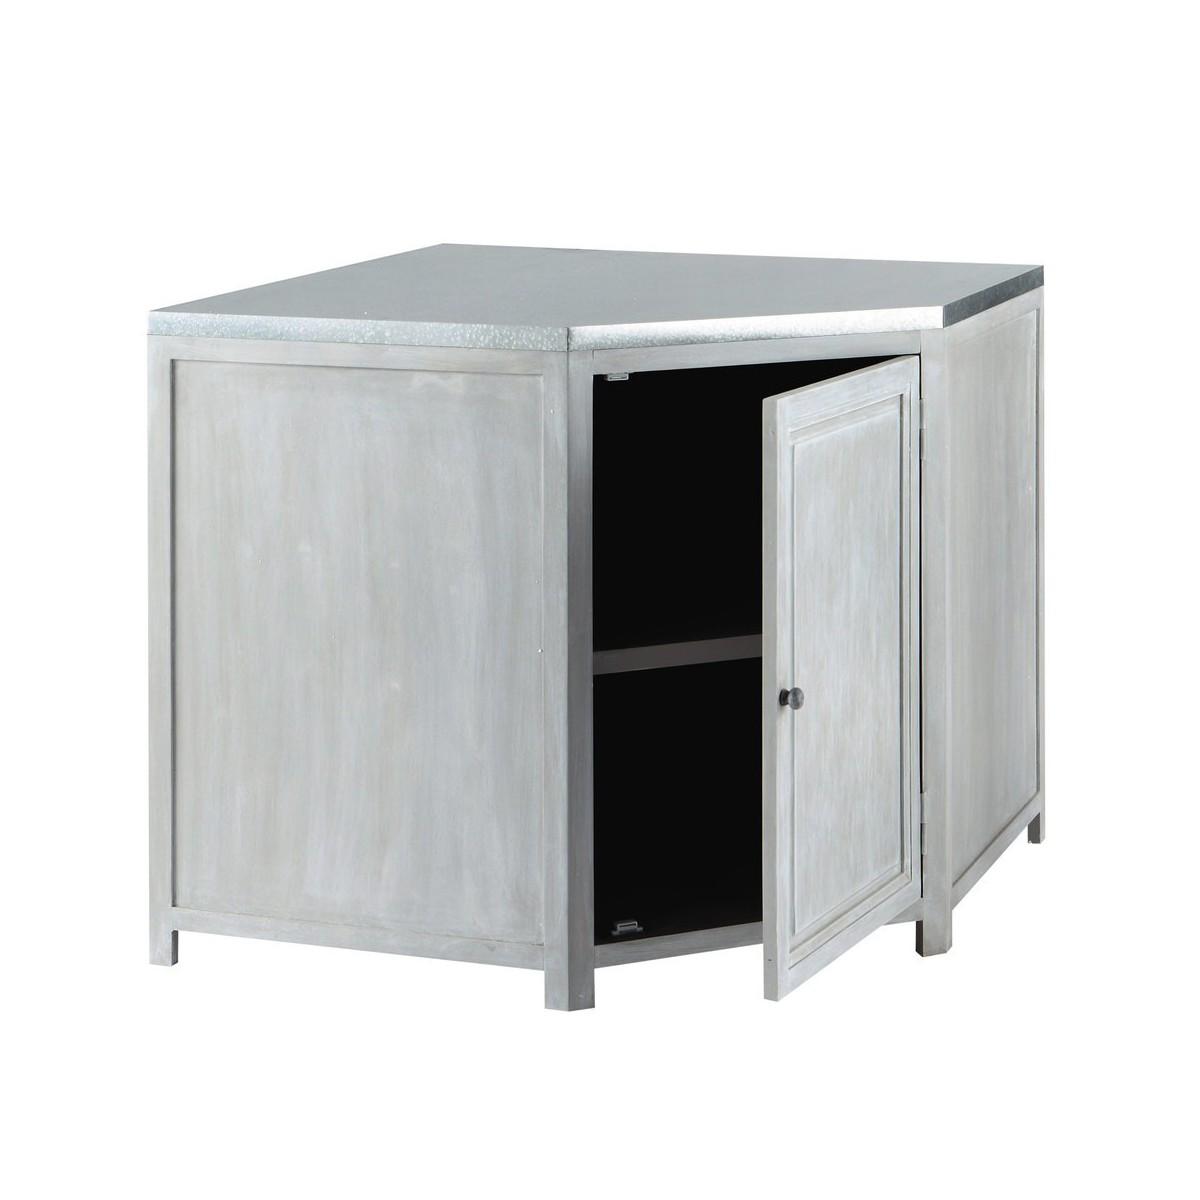 Meuble bas d 39 angle de cuisine en bois d 39 acacia gris l 99 cm for Meuble de cuisine en l